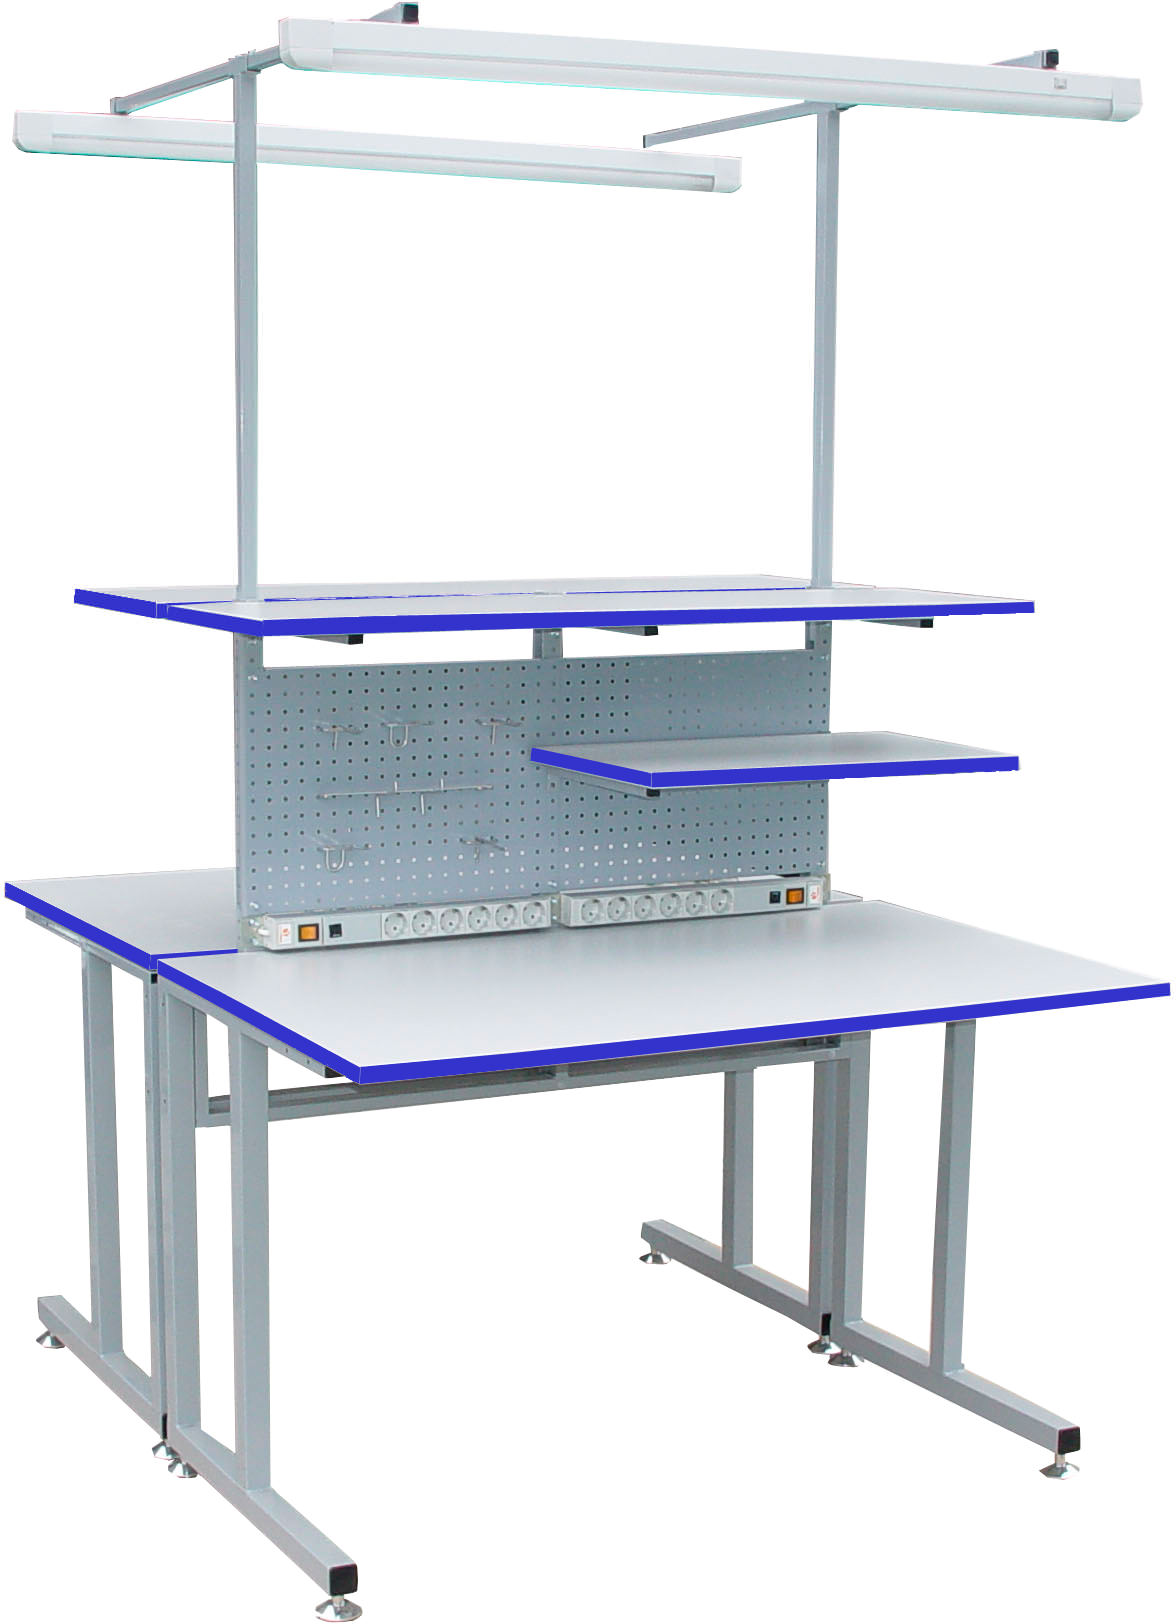 Стол рабочий антистатический С5-1200х650 Р островной ESD, фото 2